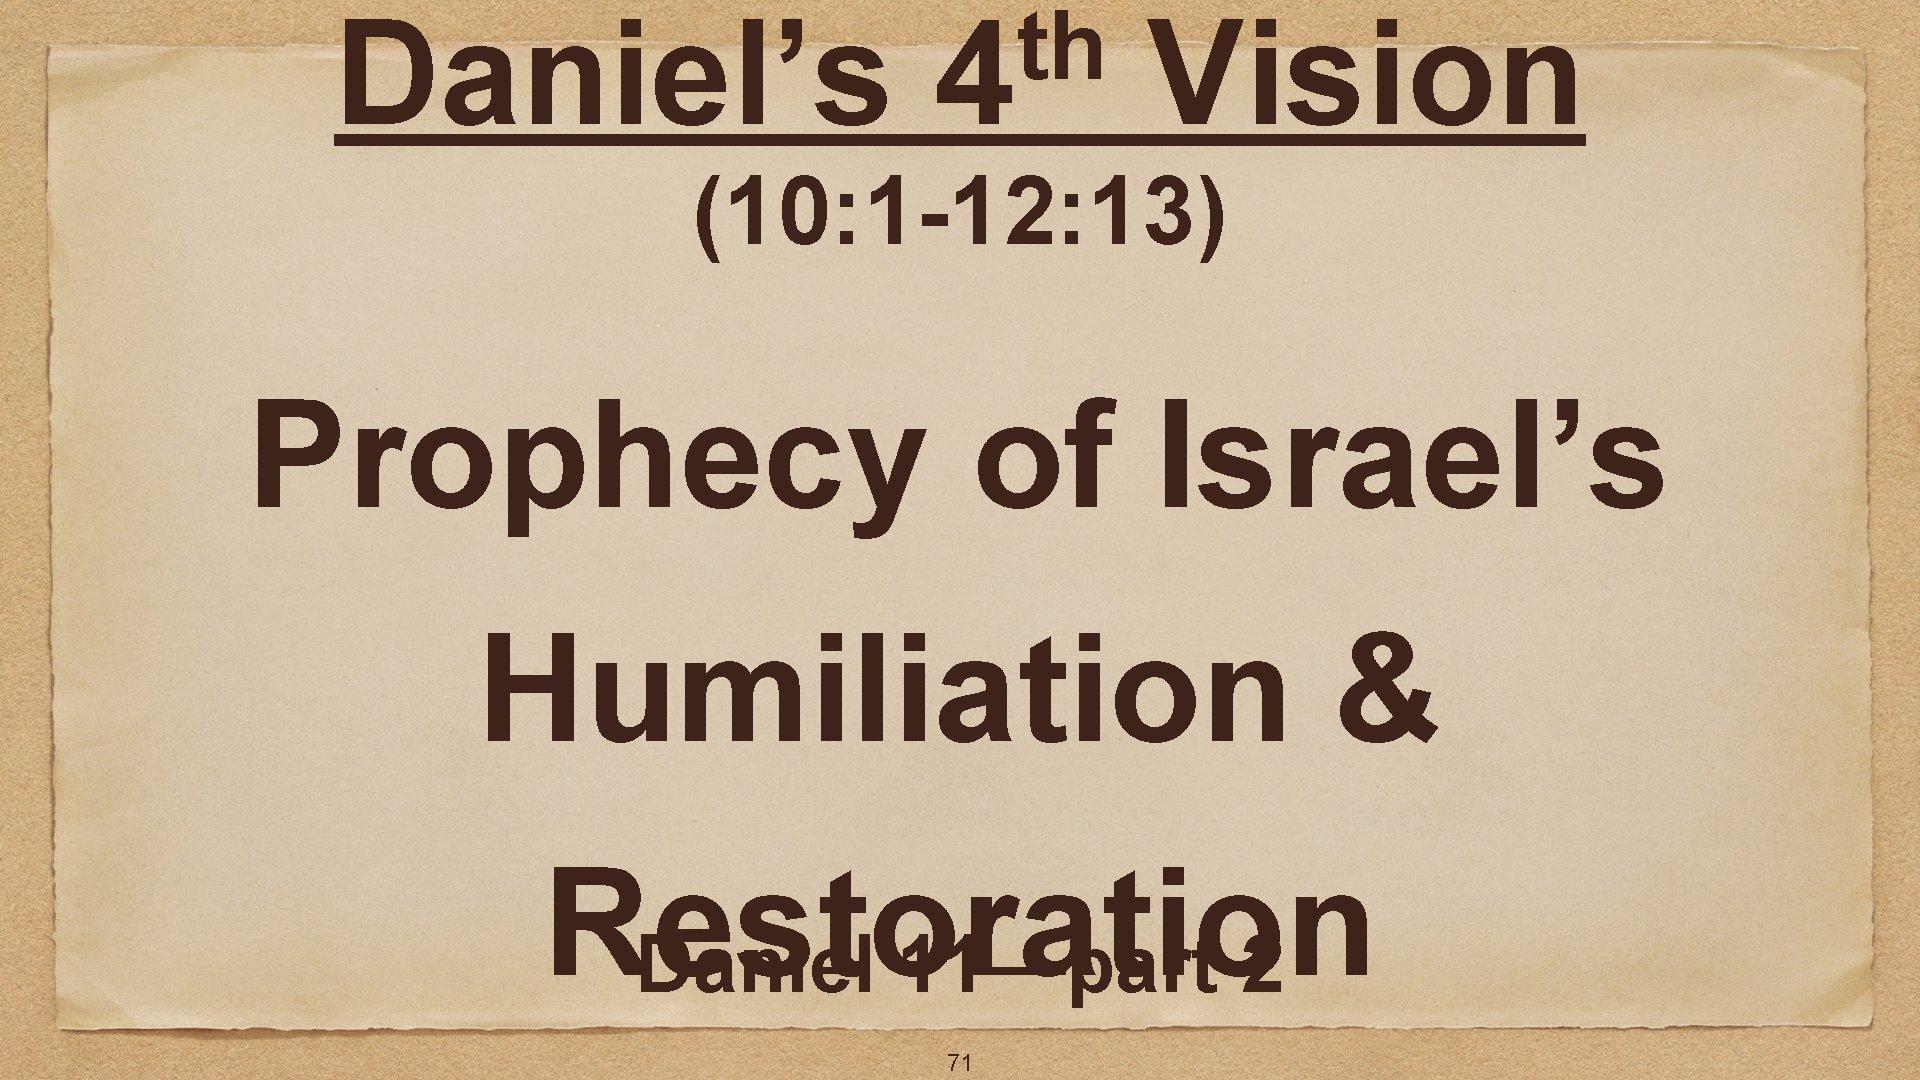 Daniel's th 4 Vision (10: 1 -12: 13) Prophecy of Israel's Humiliation & Restoration